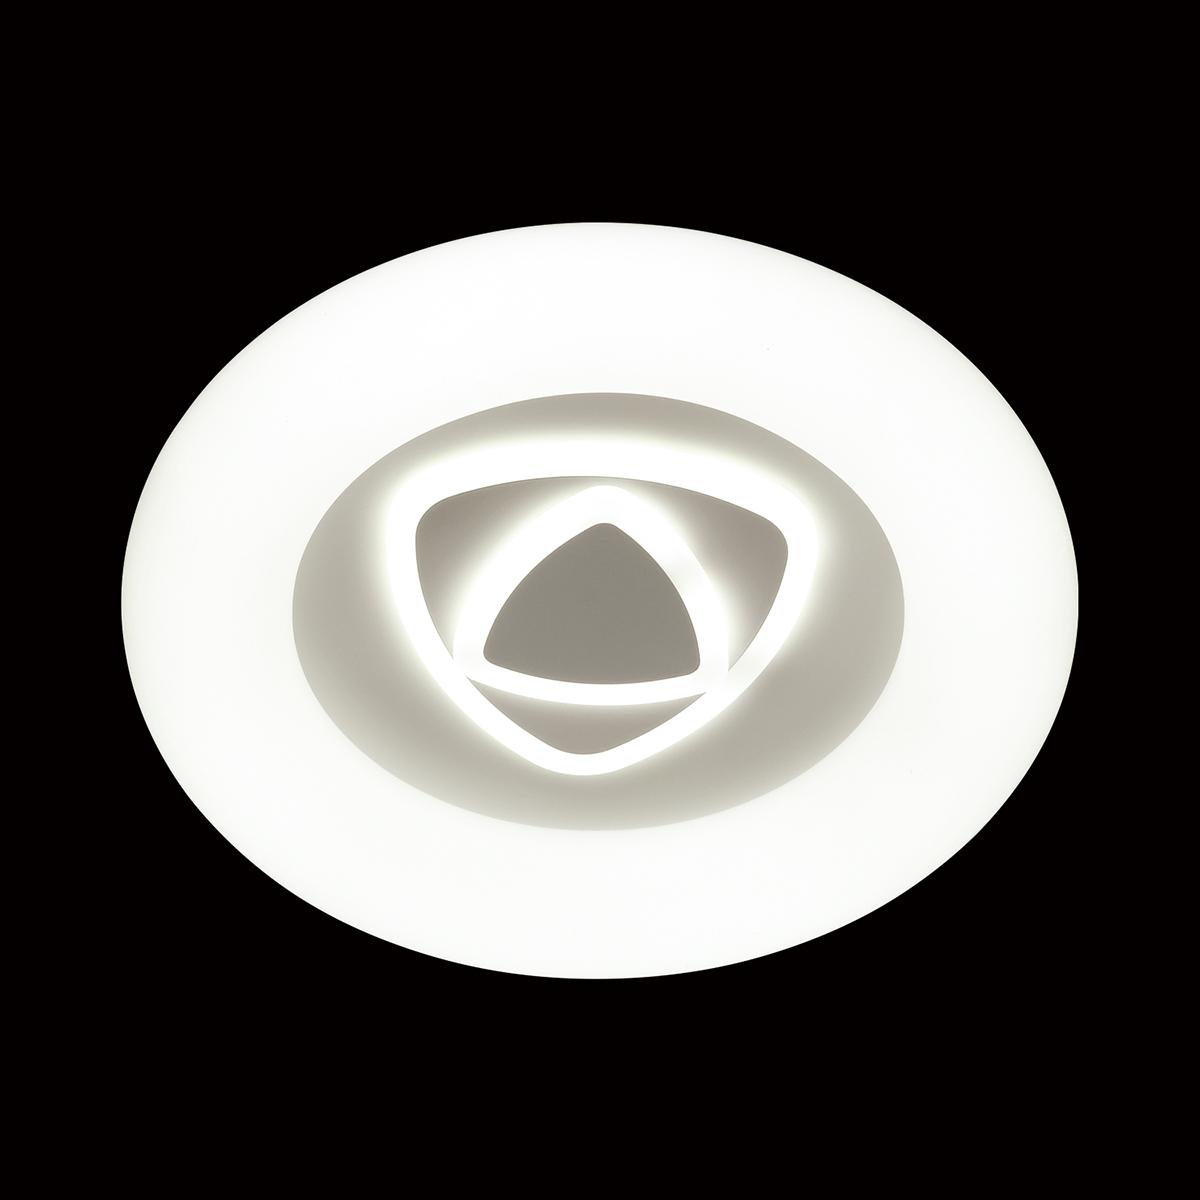 Потолочная люстра Lumion Otto 4419/99CL, белый, металл, пластик - фото 5